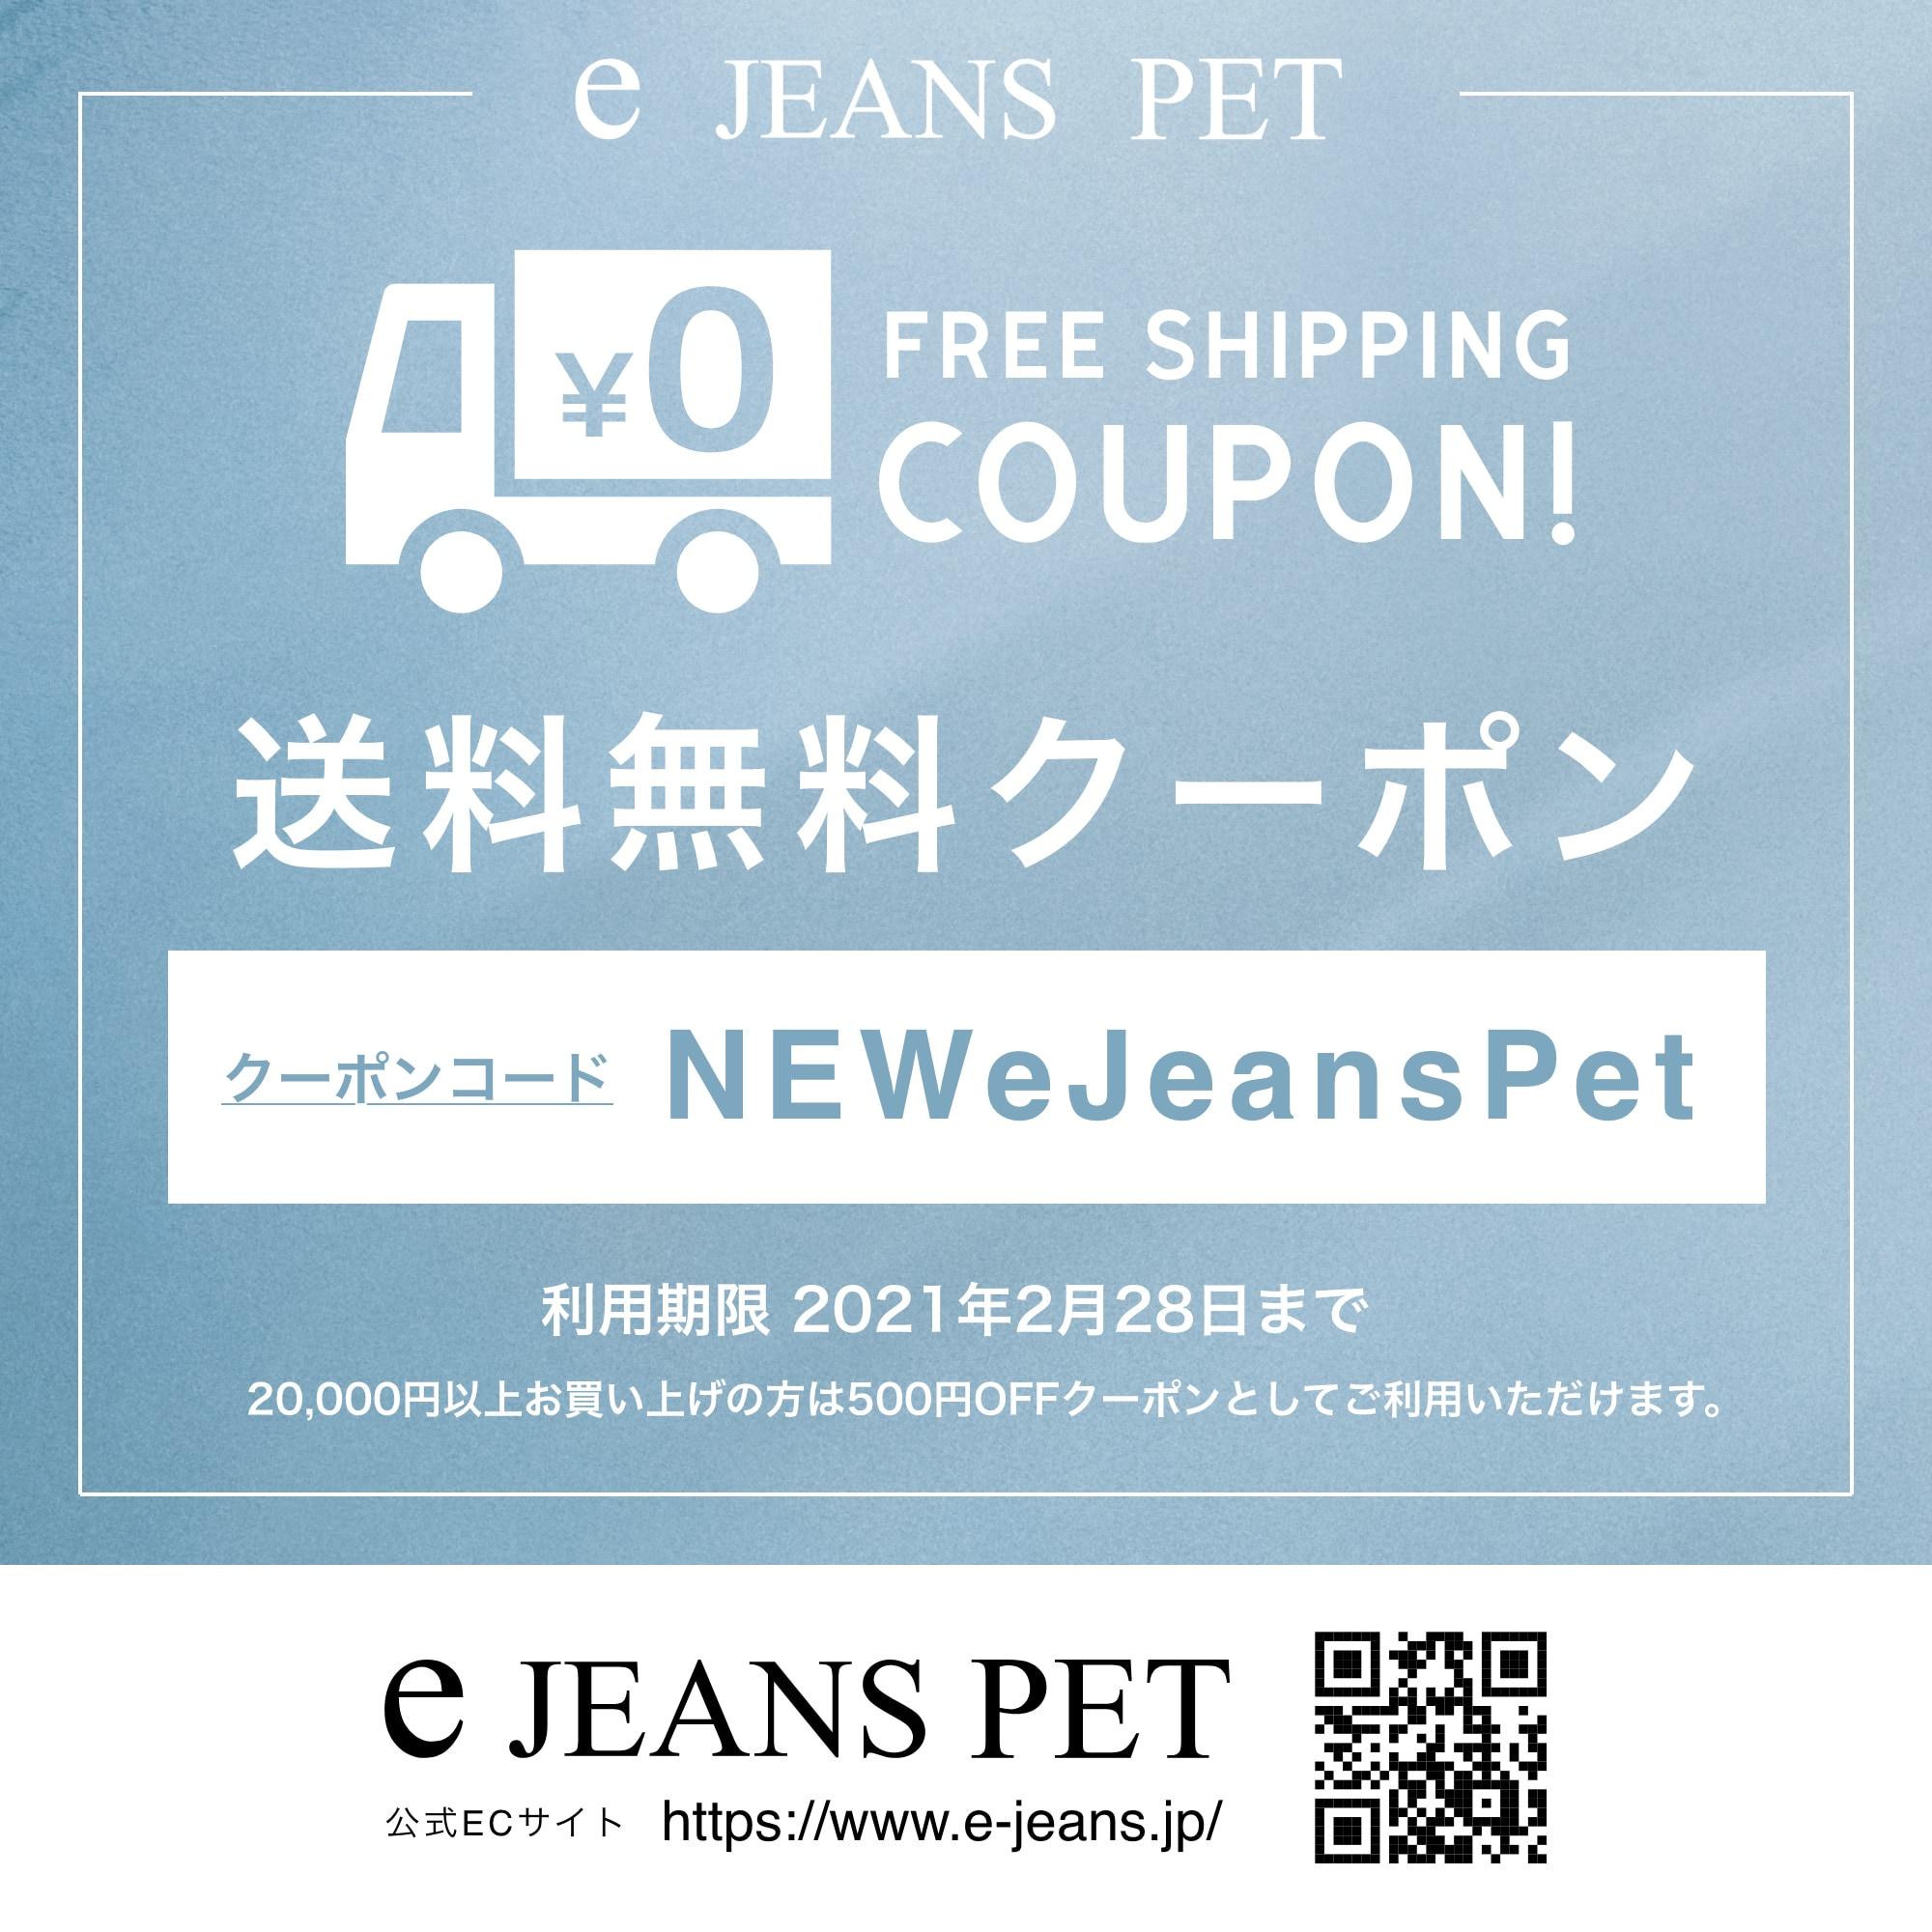 e JEANS PET発売記念!送料無料クーポンプレゼント!